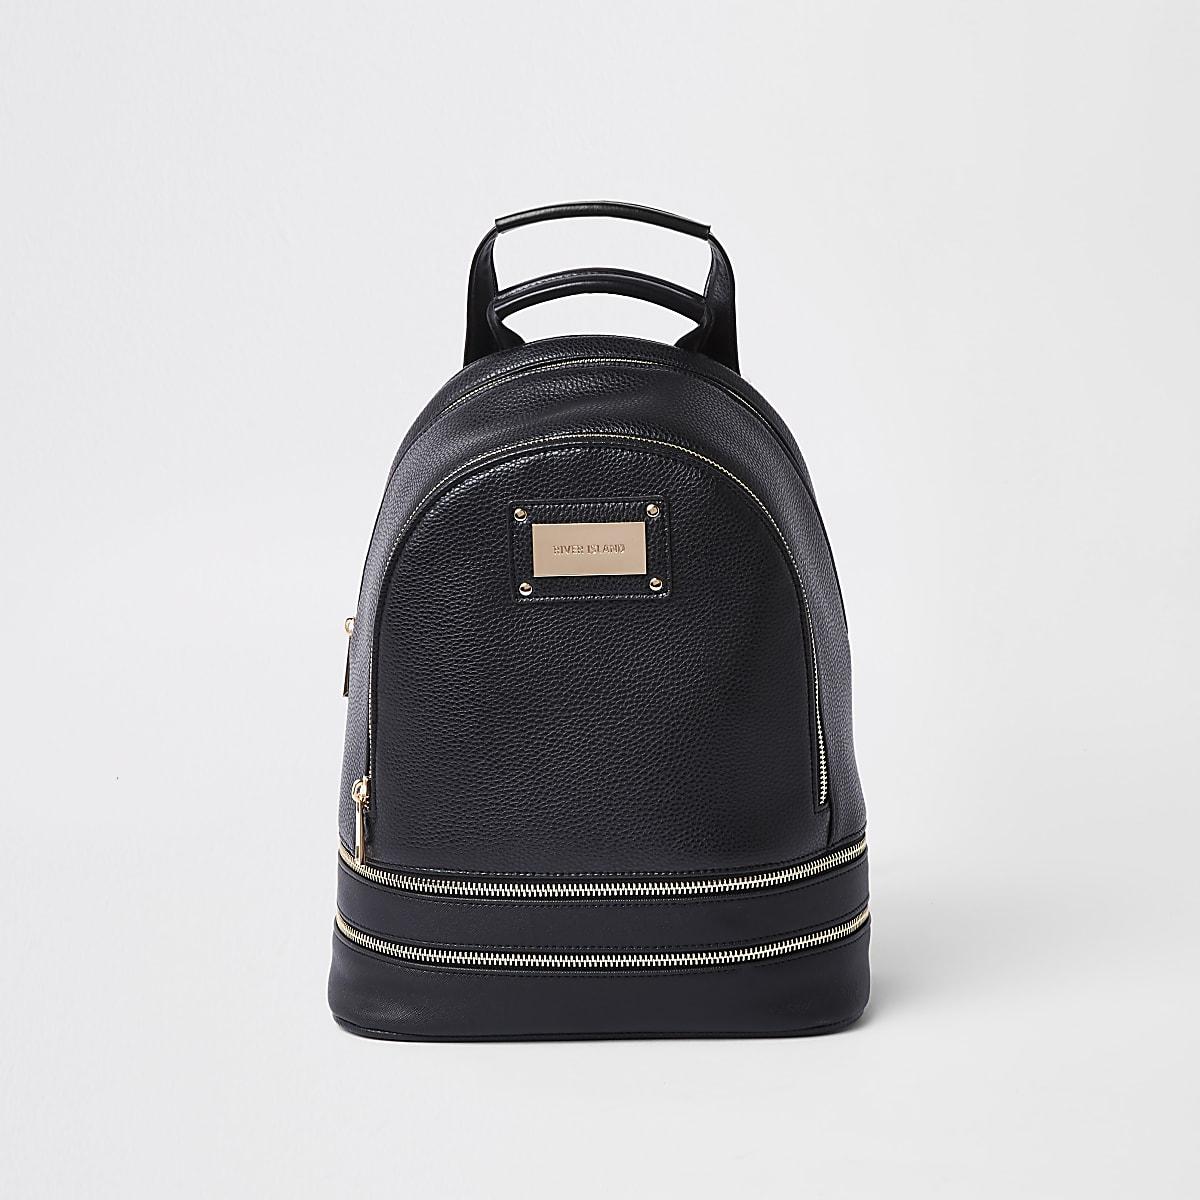 Black zip around backpack